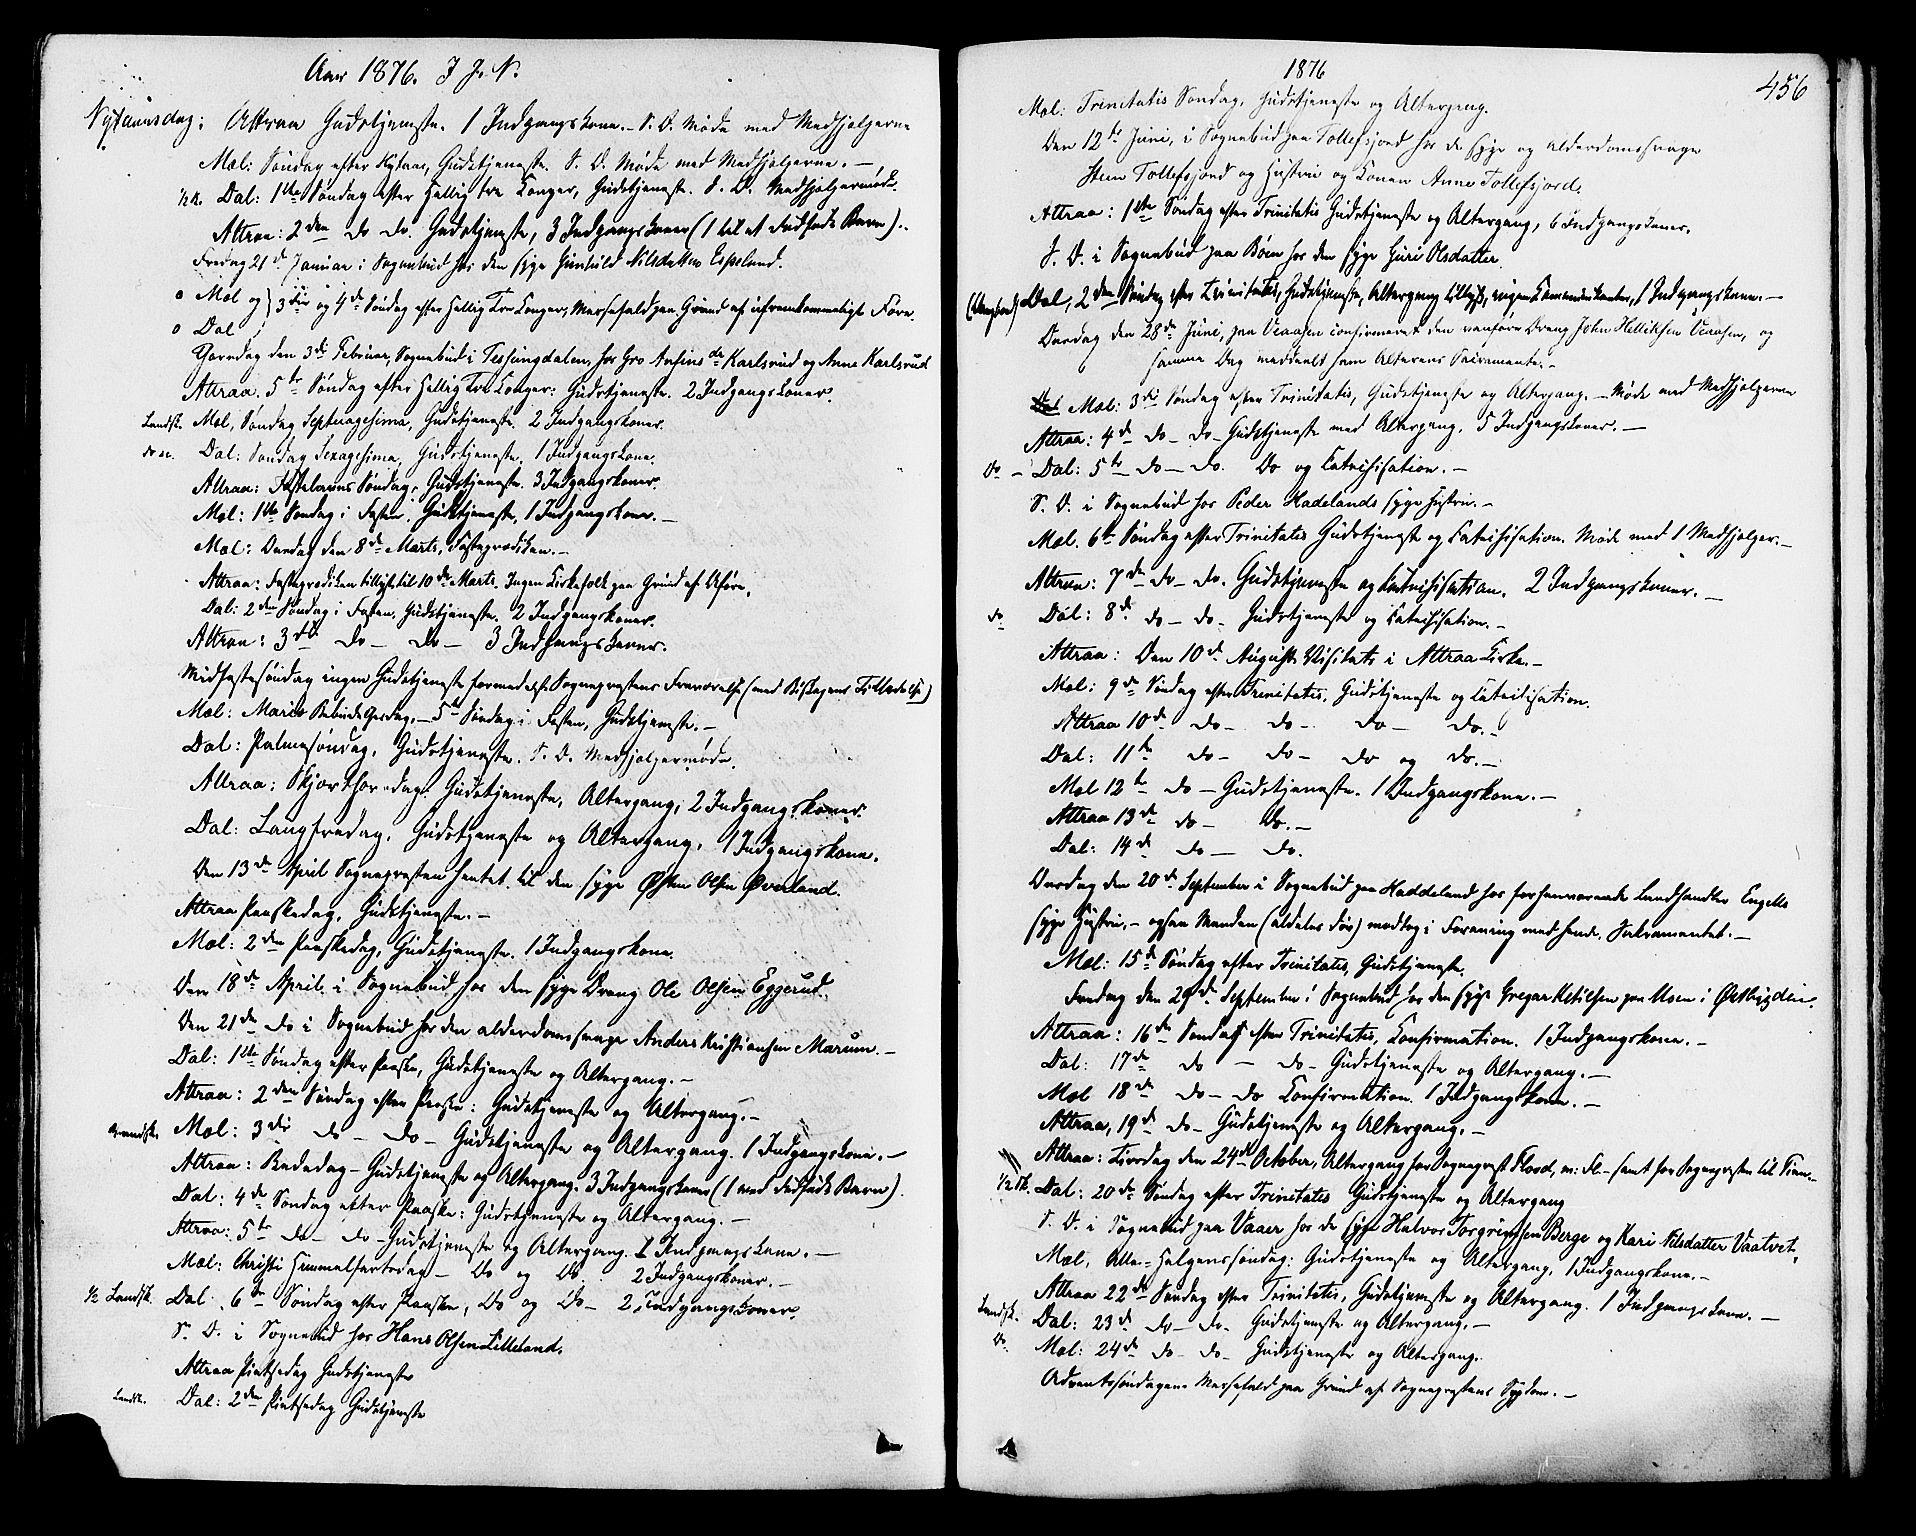 SAKO, Tinn kirkebøker, F/Fa/L0006: Ministerialbok nr. I 6, 1857-1878, s. 456